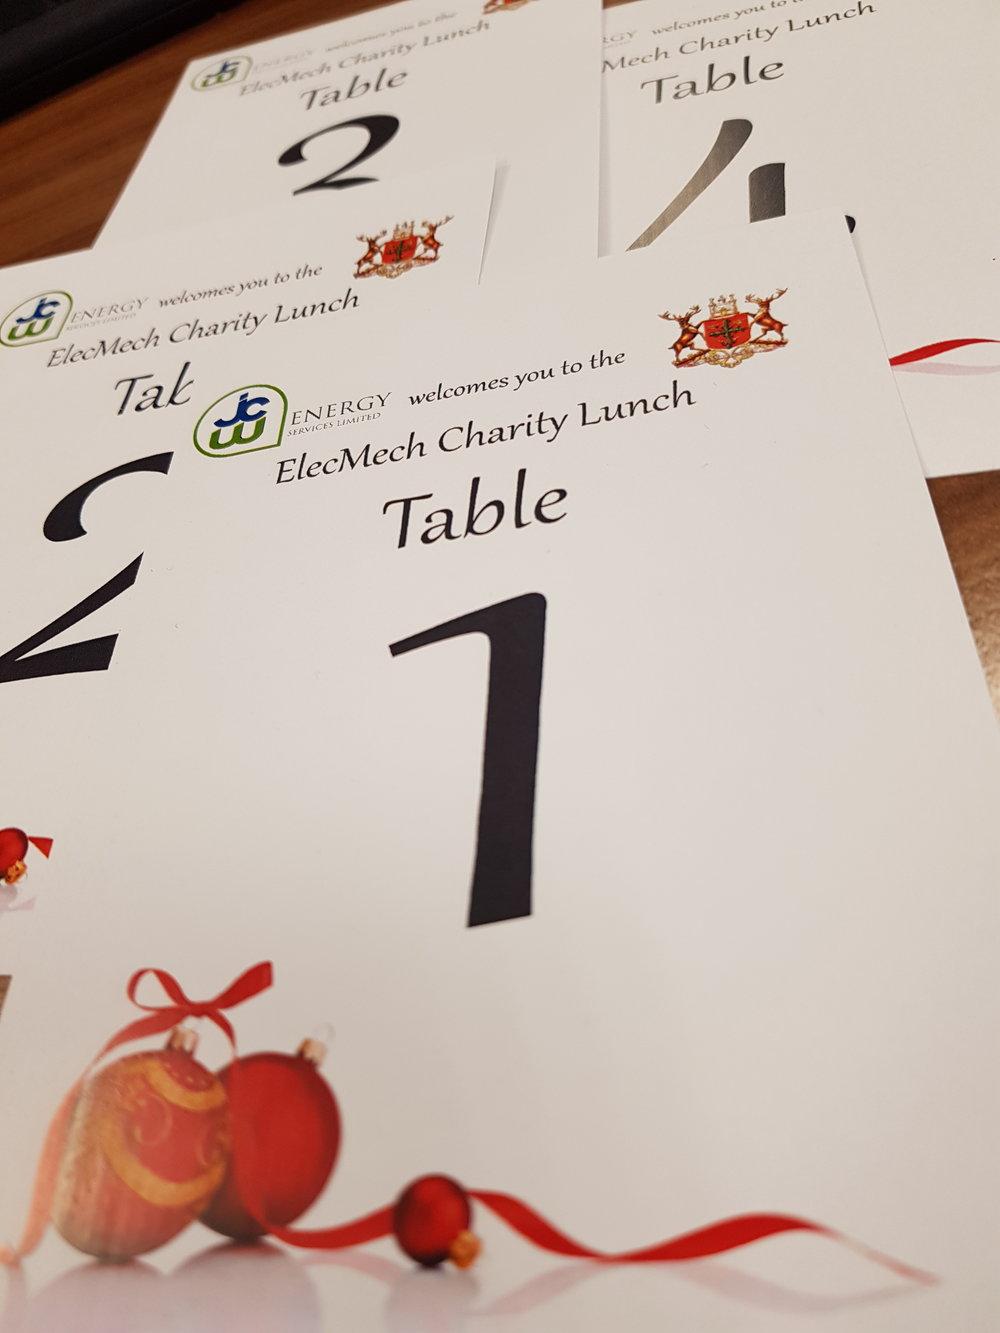 ElecMech Charity Lunch Place Settings